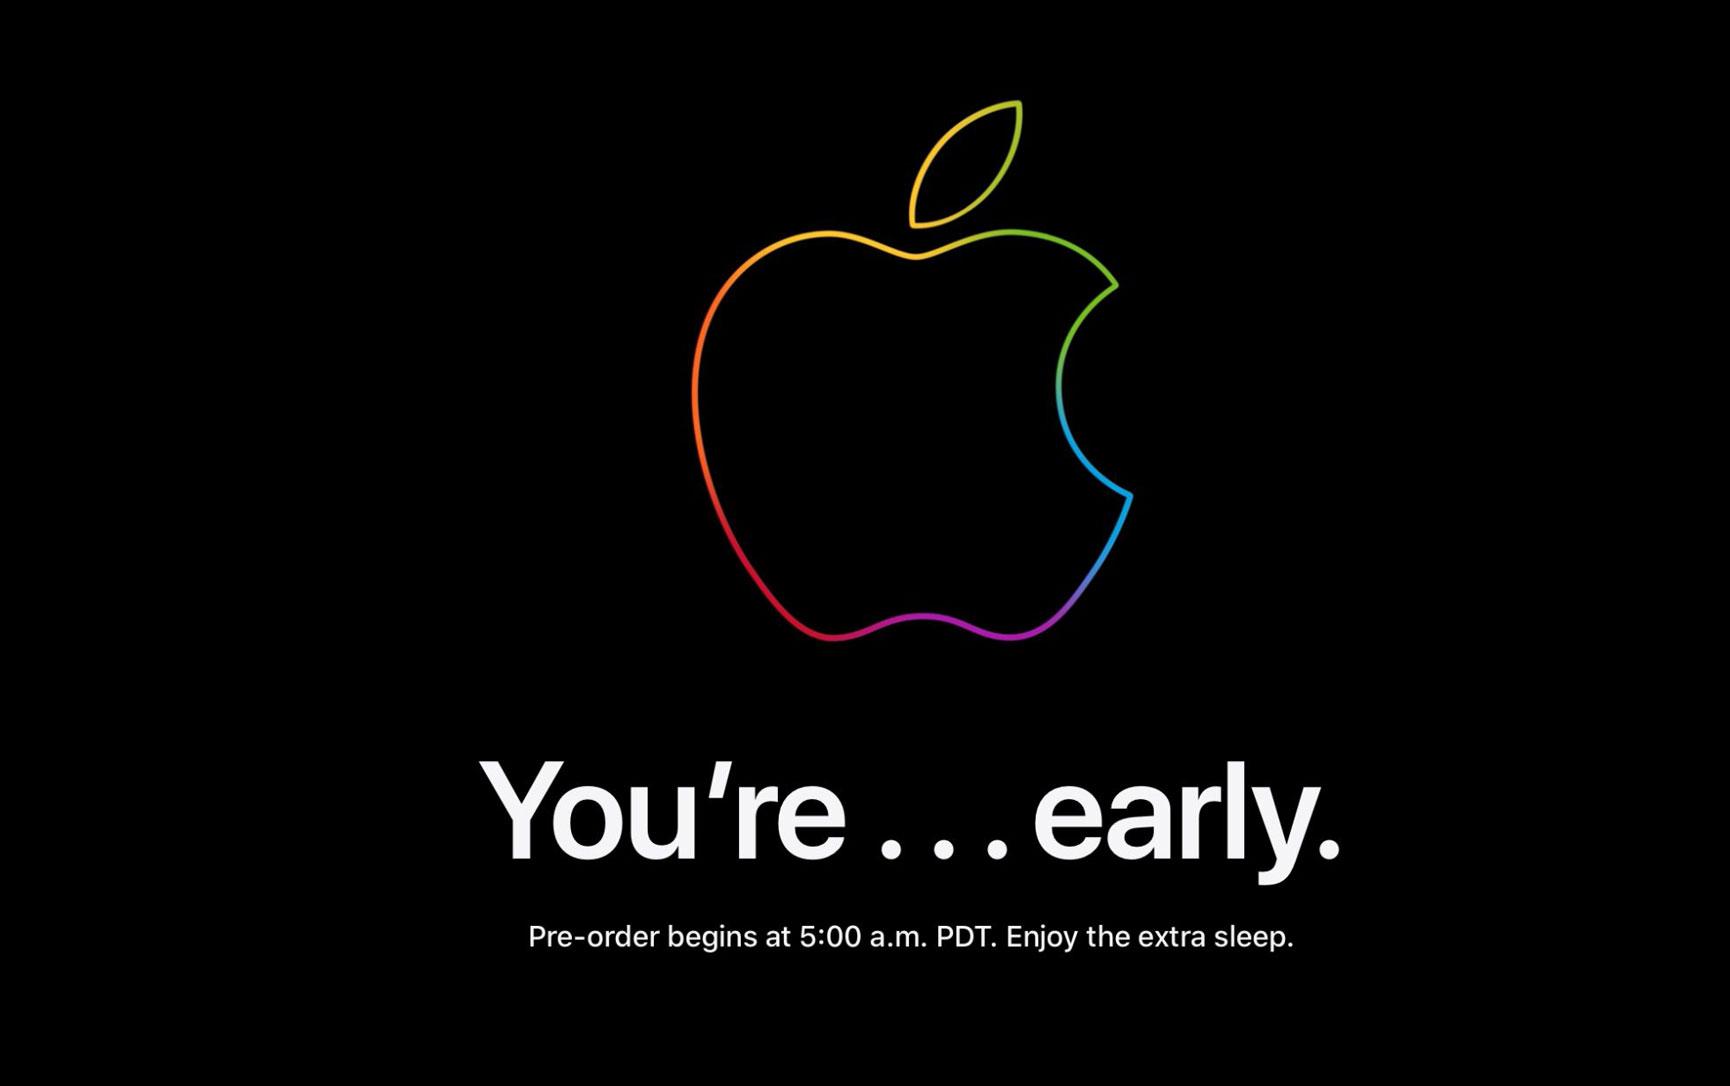 Apple Store is down ahead of iPhone 13 preorders